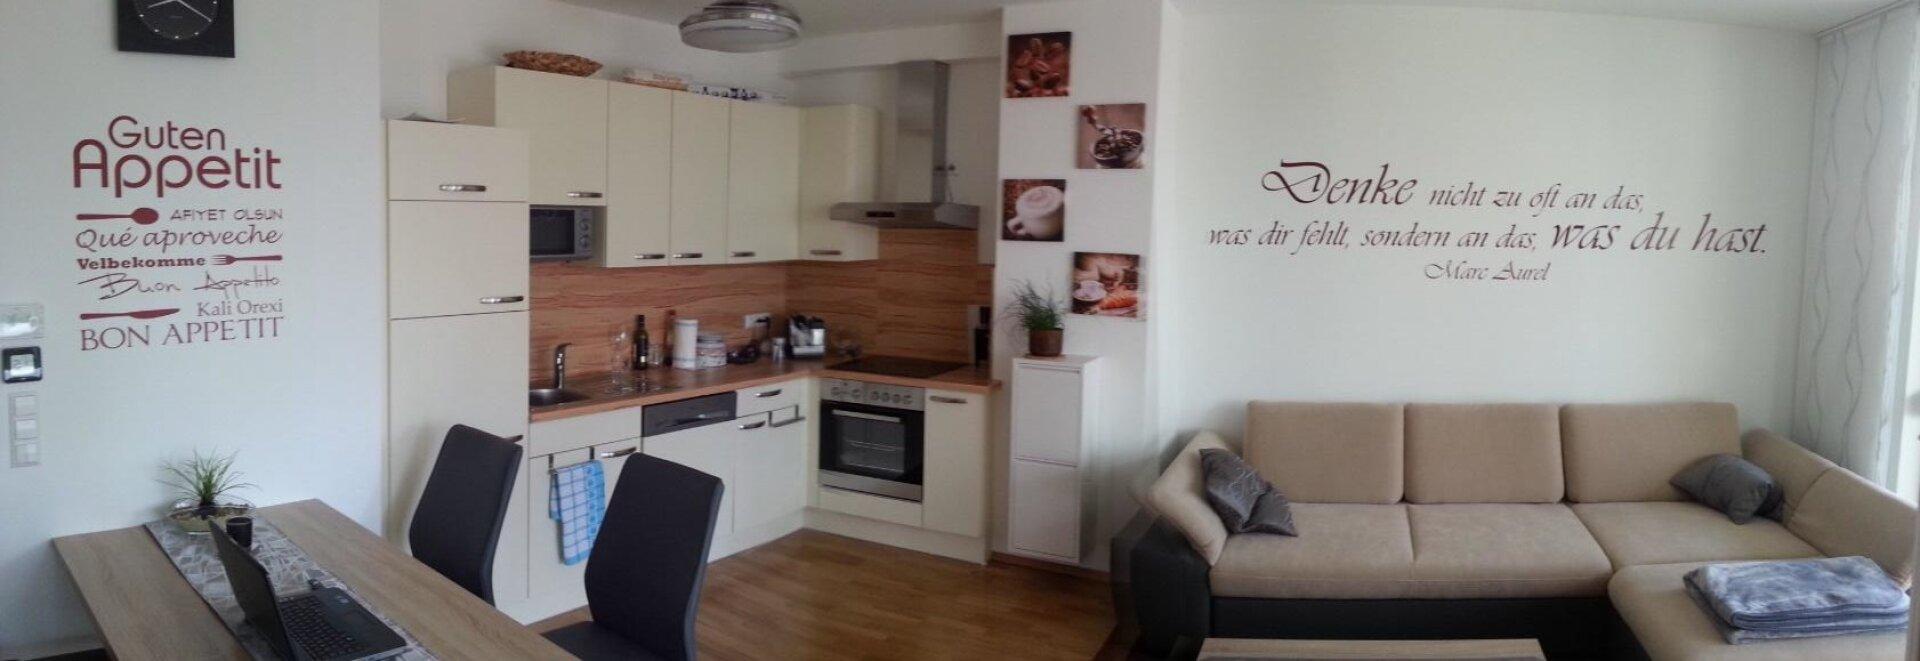 3-Zimmer-Mietwohnung Villach - SAGENTUS Immobilien